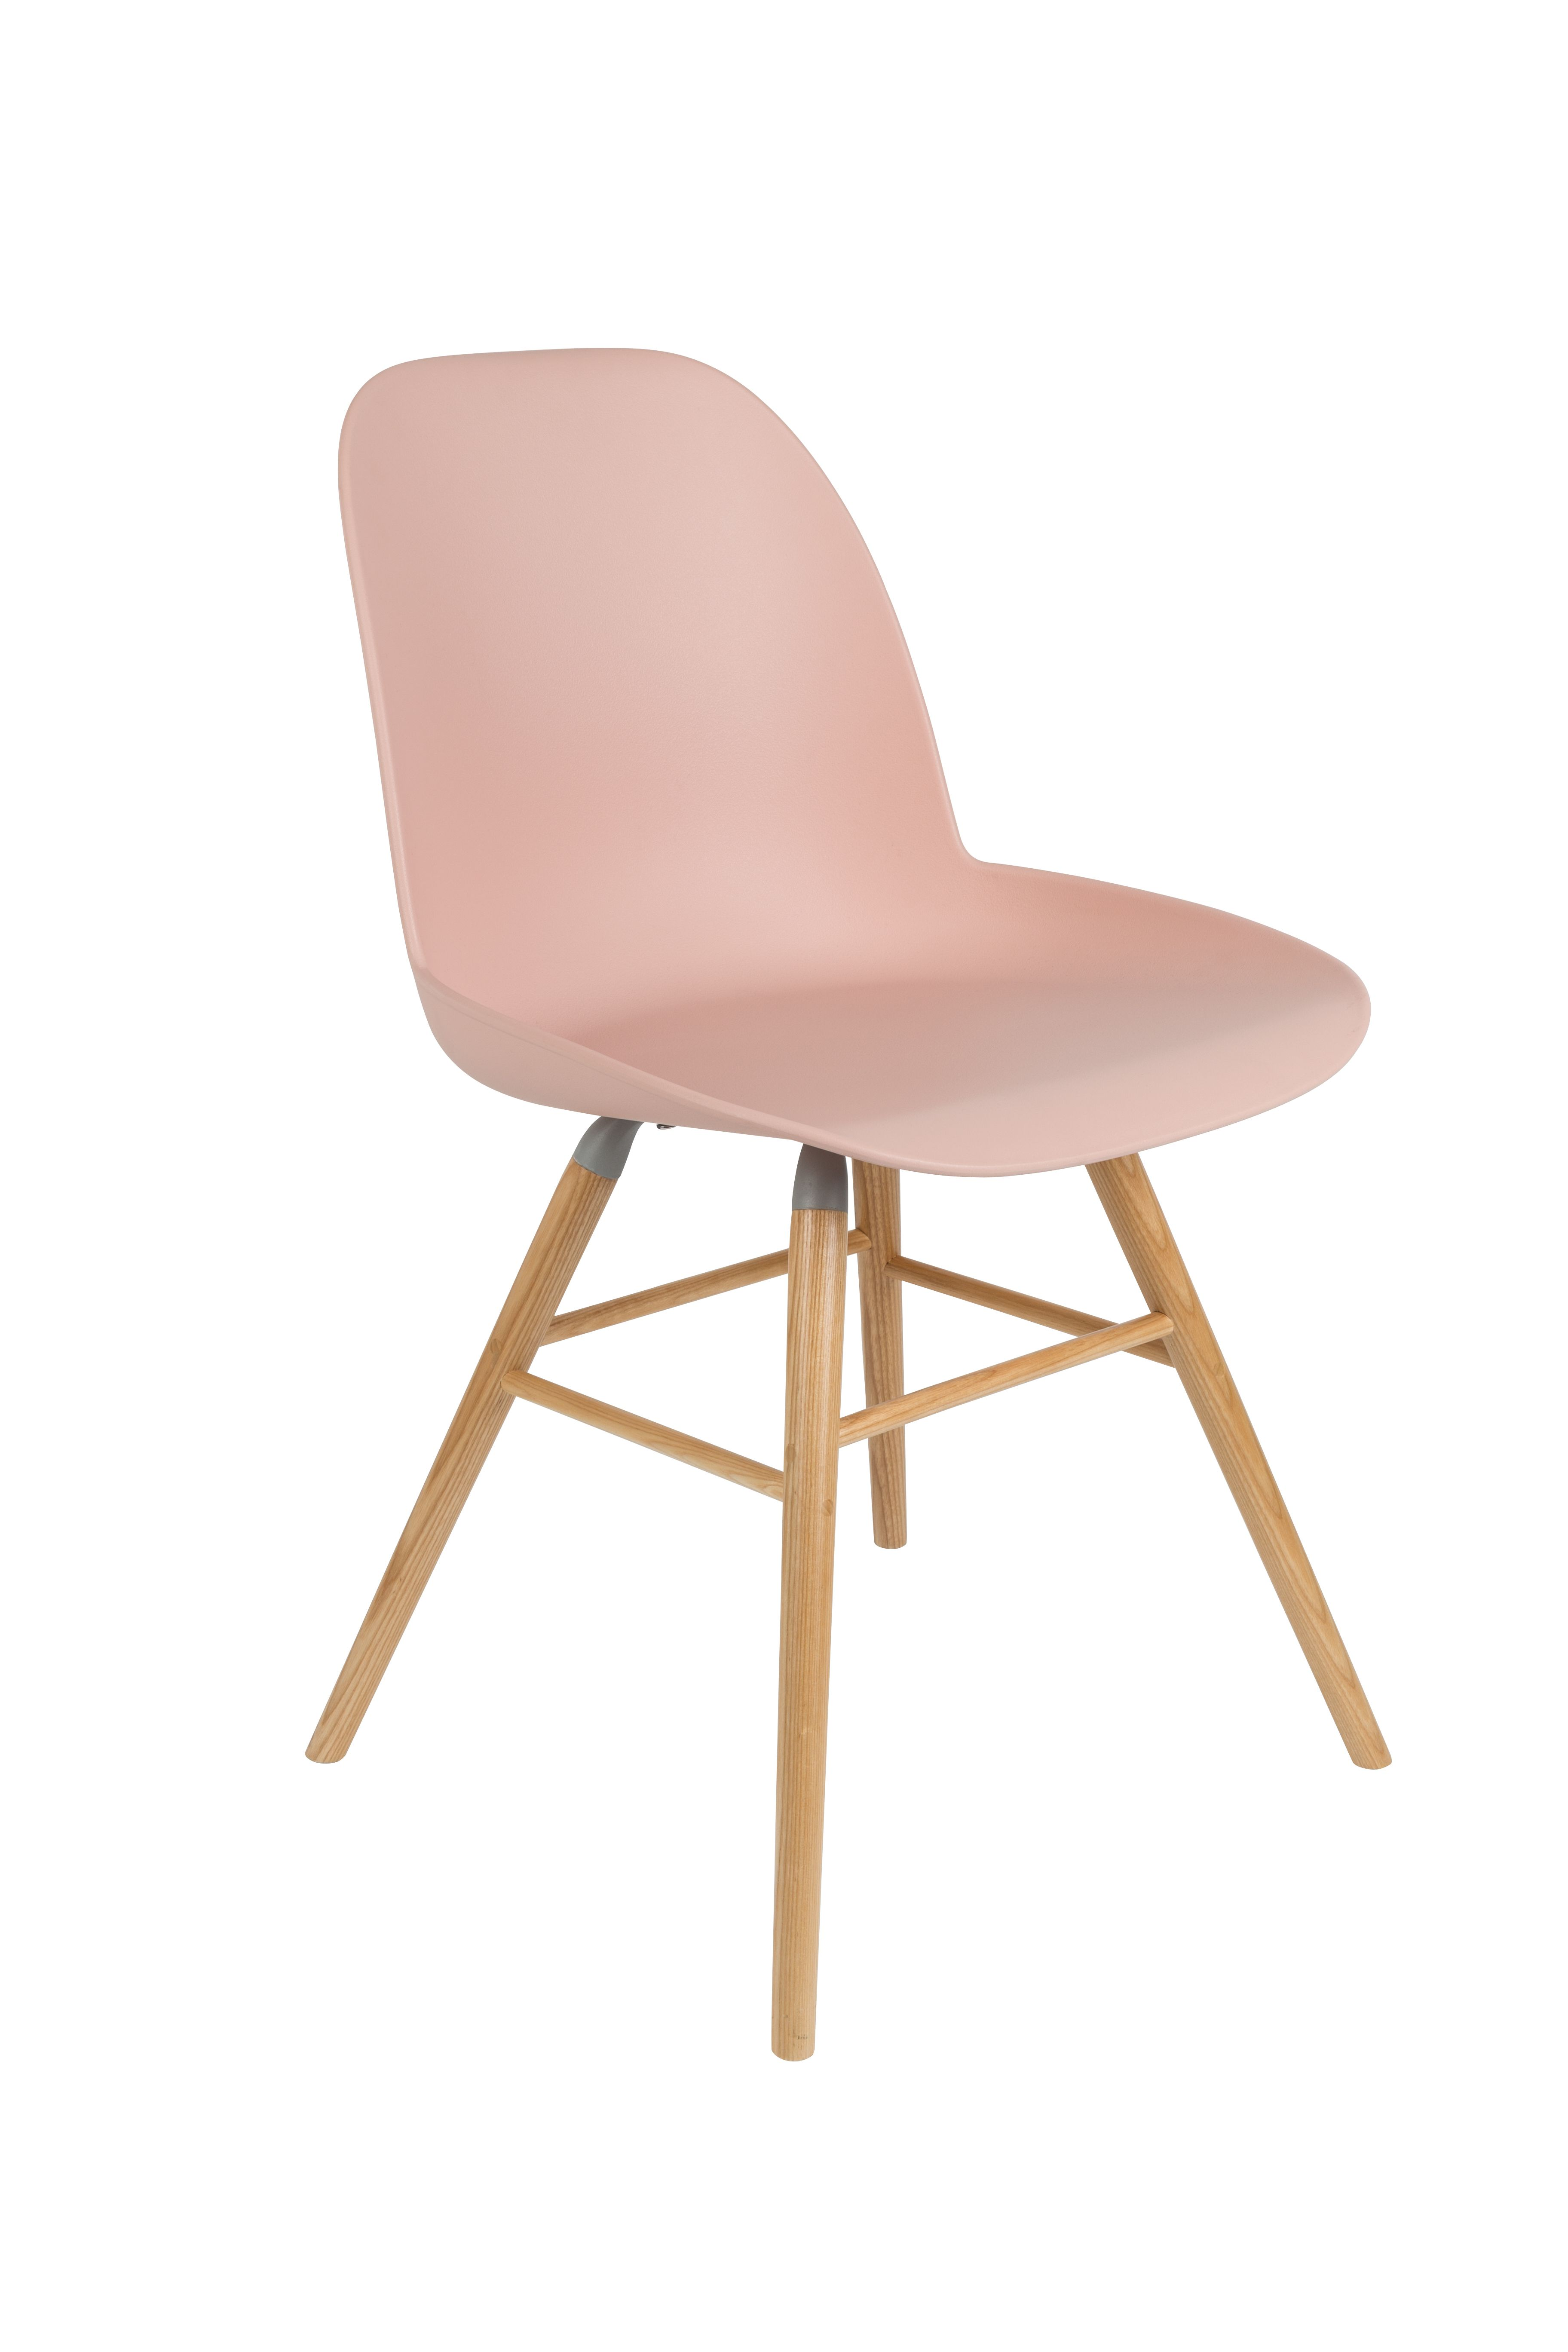 Eettafel Stoelen Kuip.Albert Kuip Chair Zuiver Chairs Pinterest Chair Dining Chairs